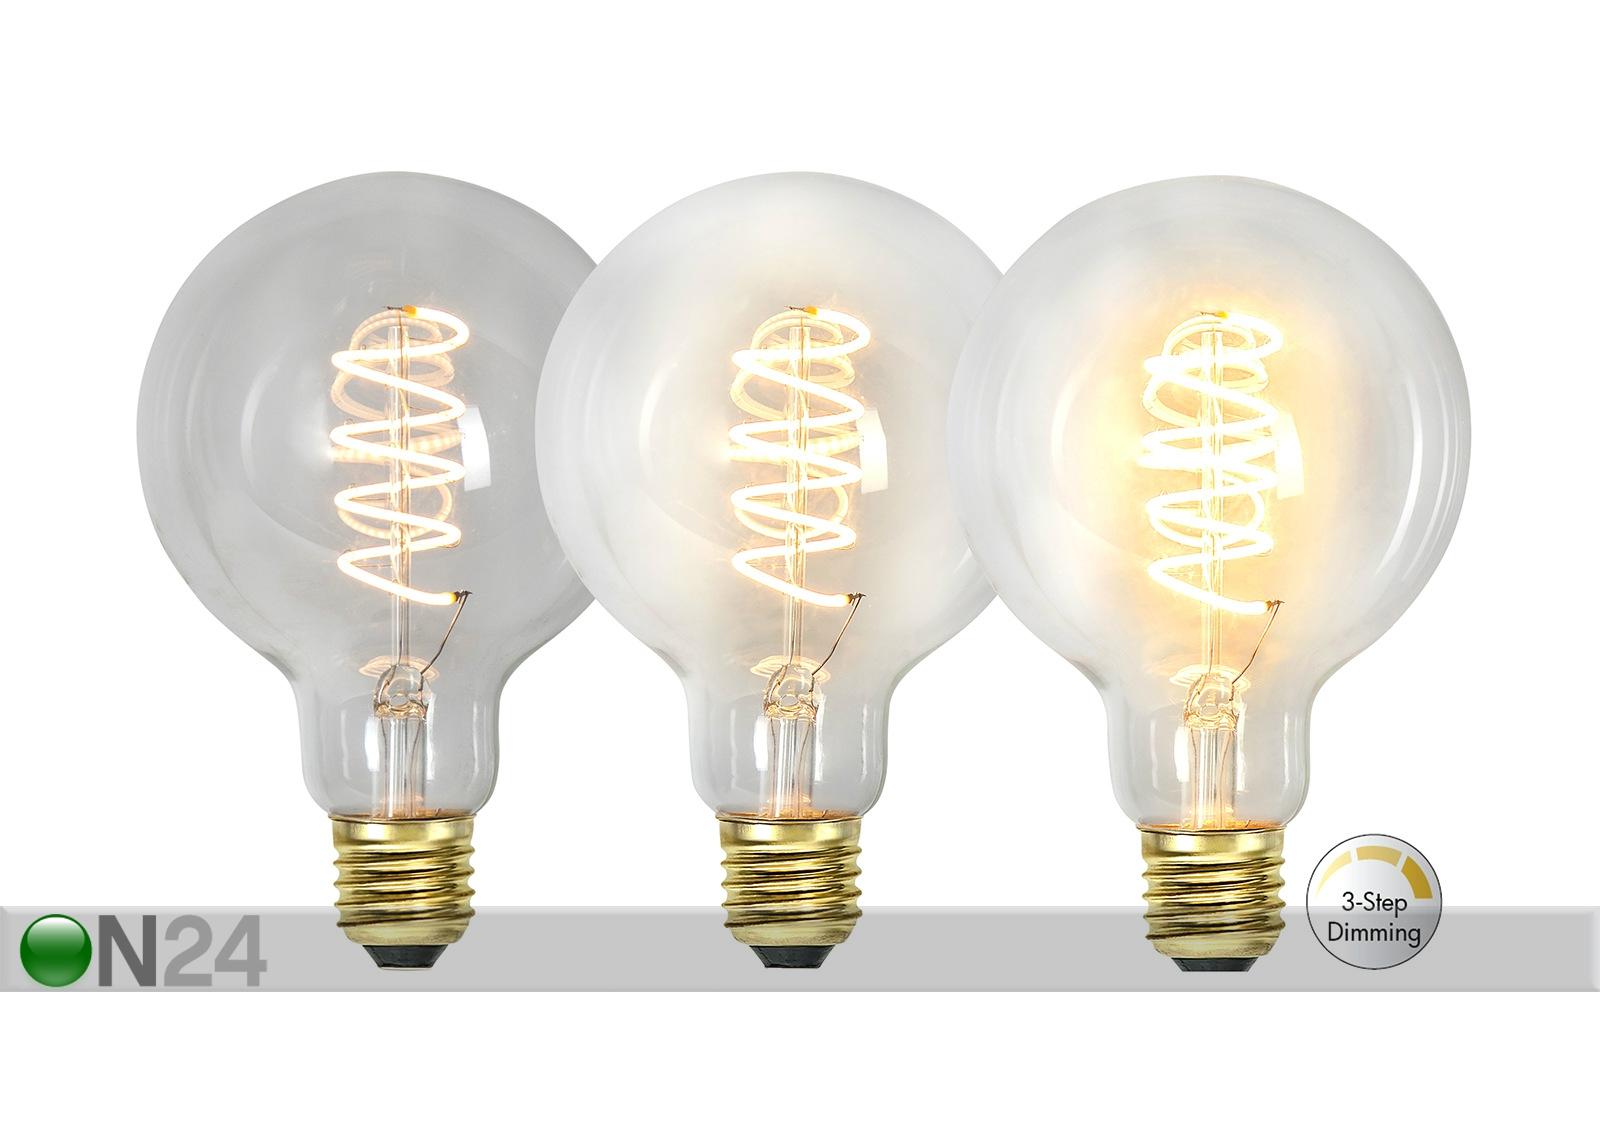 2f4d1bcfbf6 Dekoratiivne LED pirn E27 4 W AA-153721 - ON24 Sisustuskaubamaja